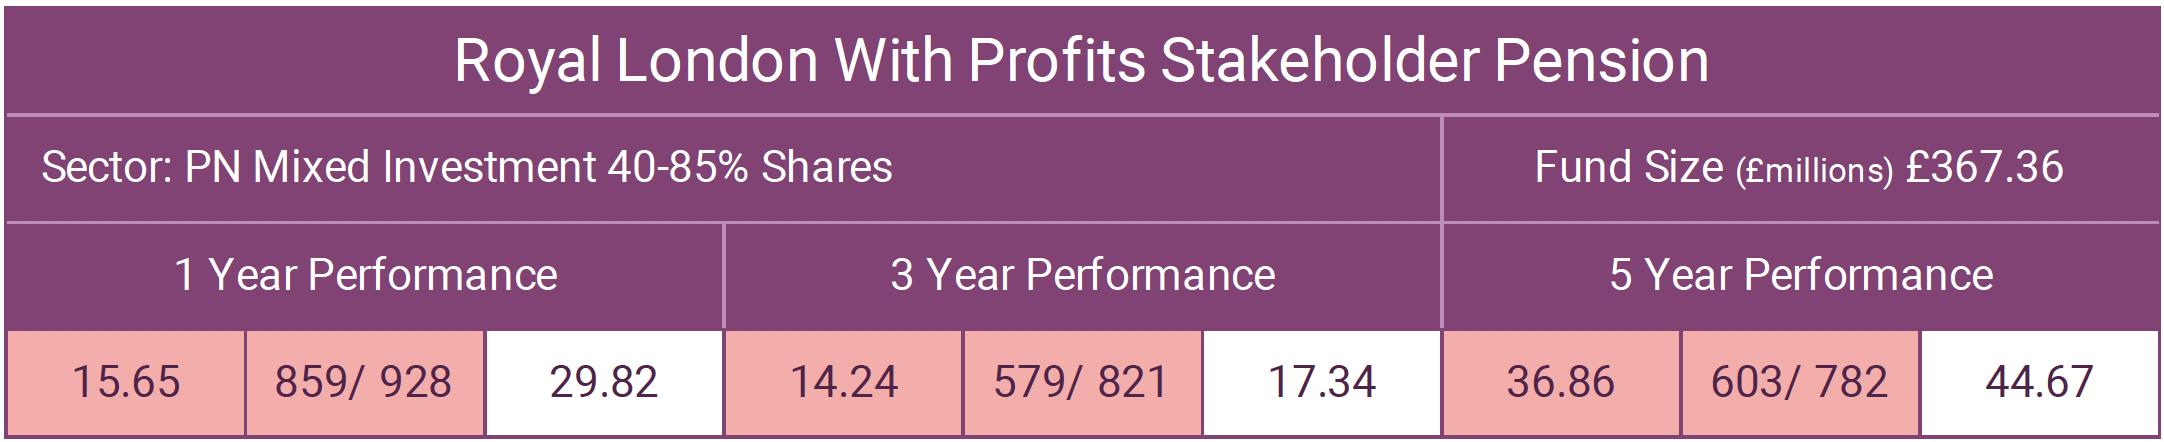 RL With Profits